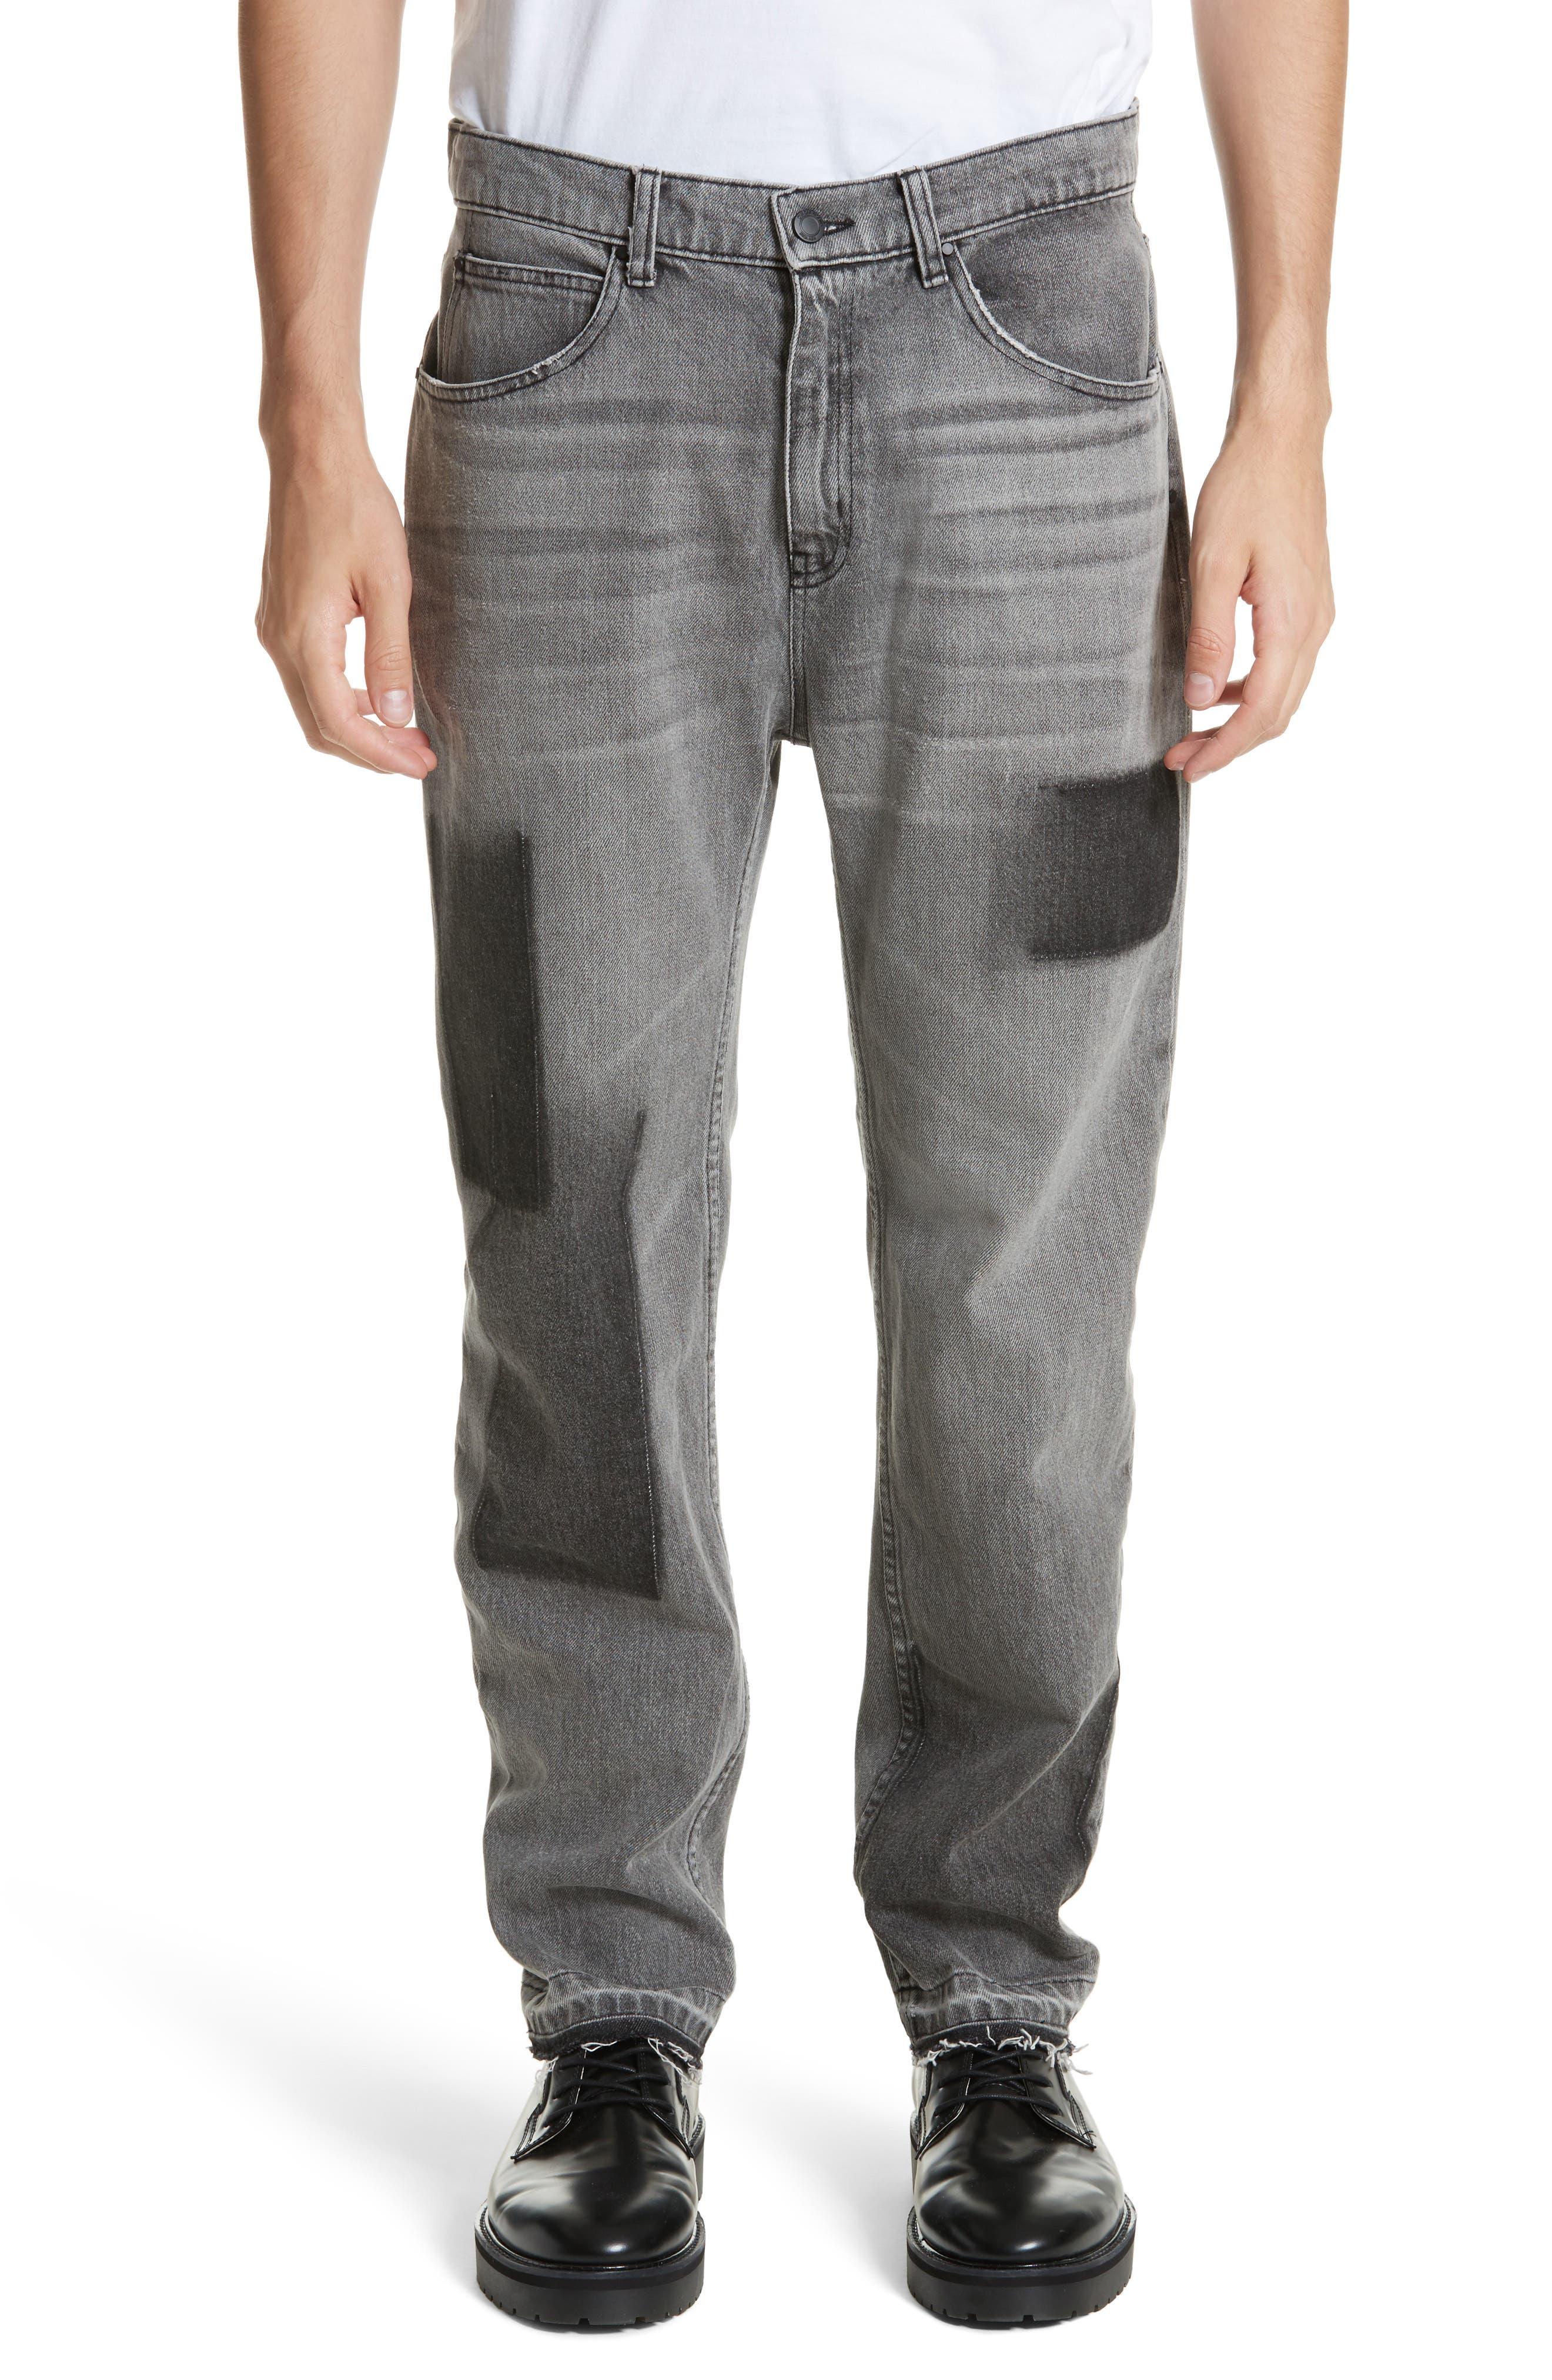 OVADIA & SONS OS-2 Straight Leg Jeans